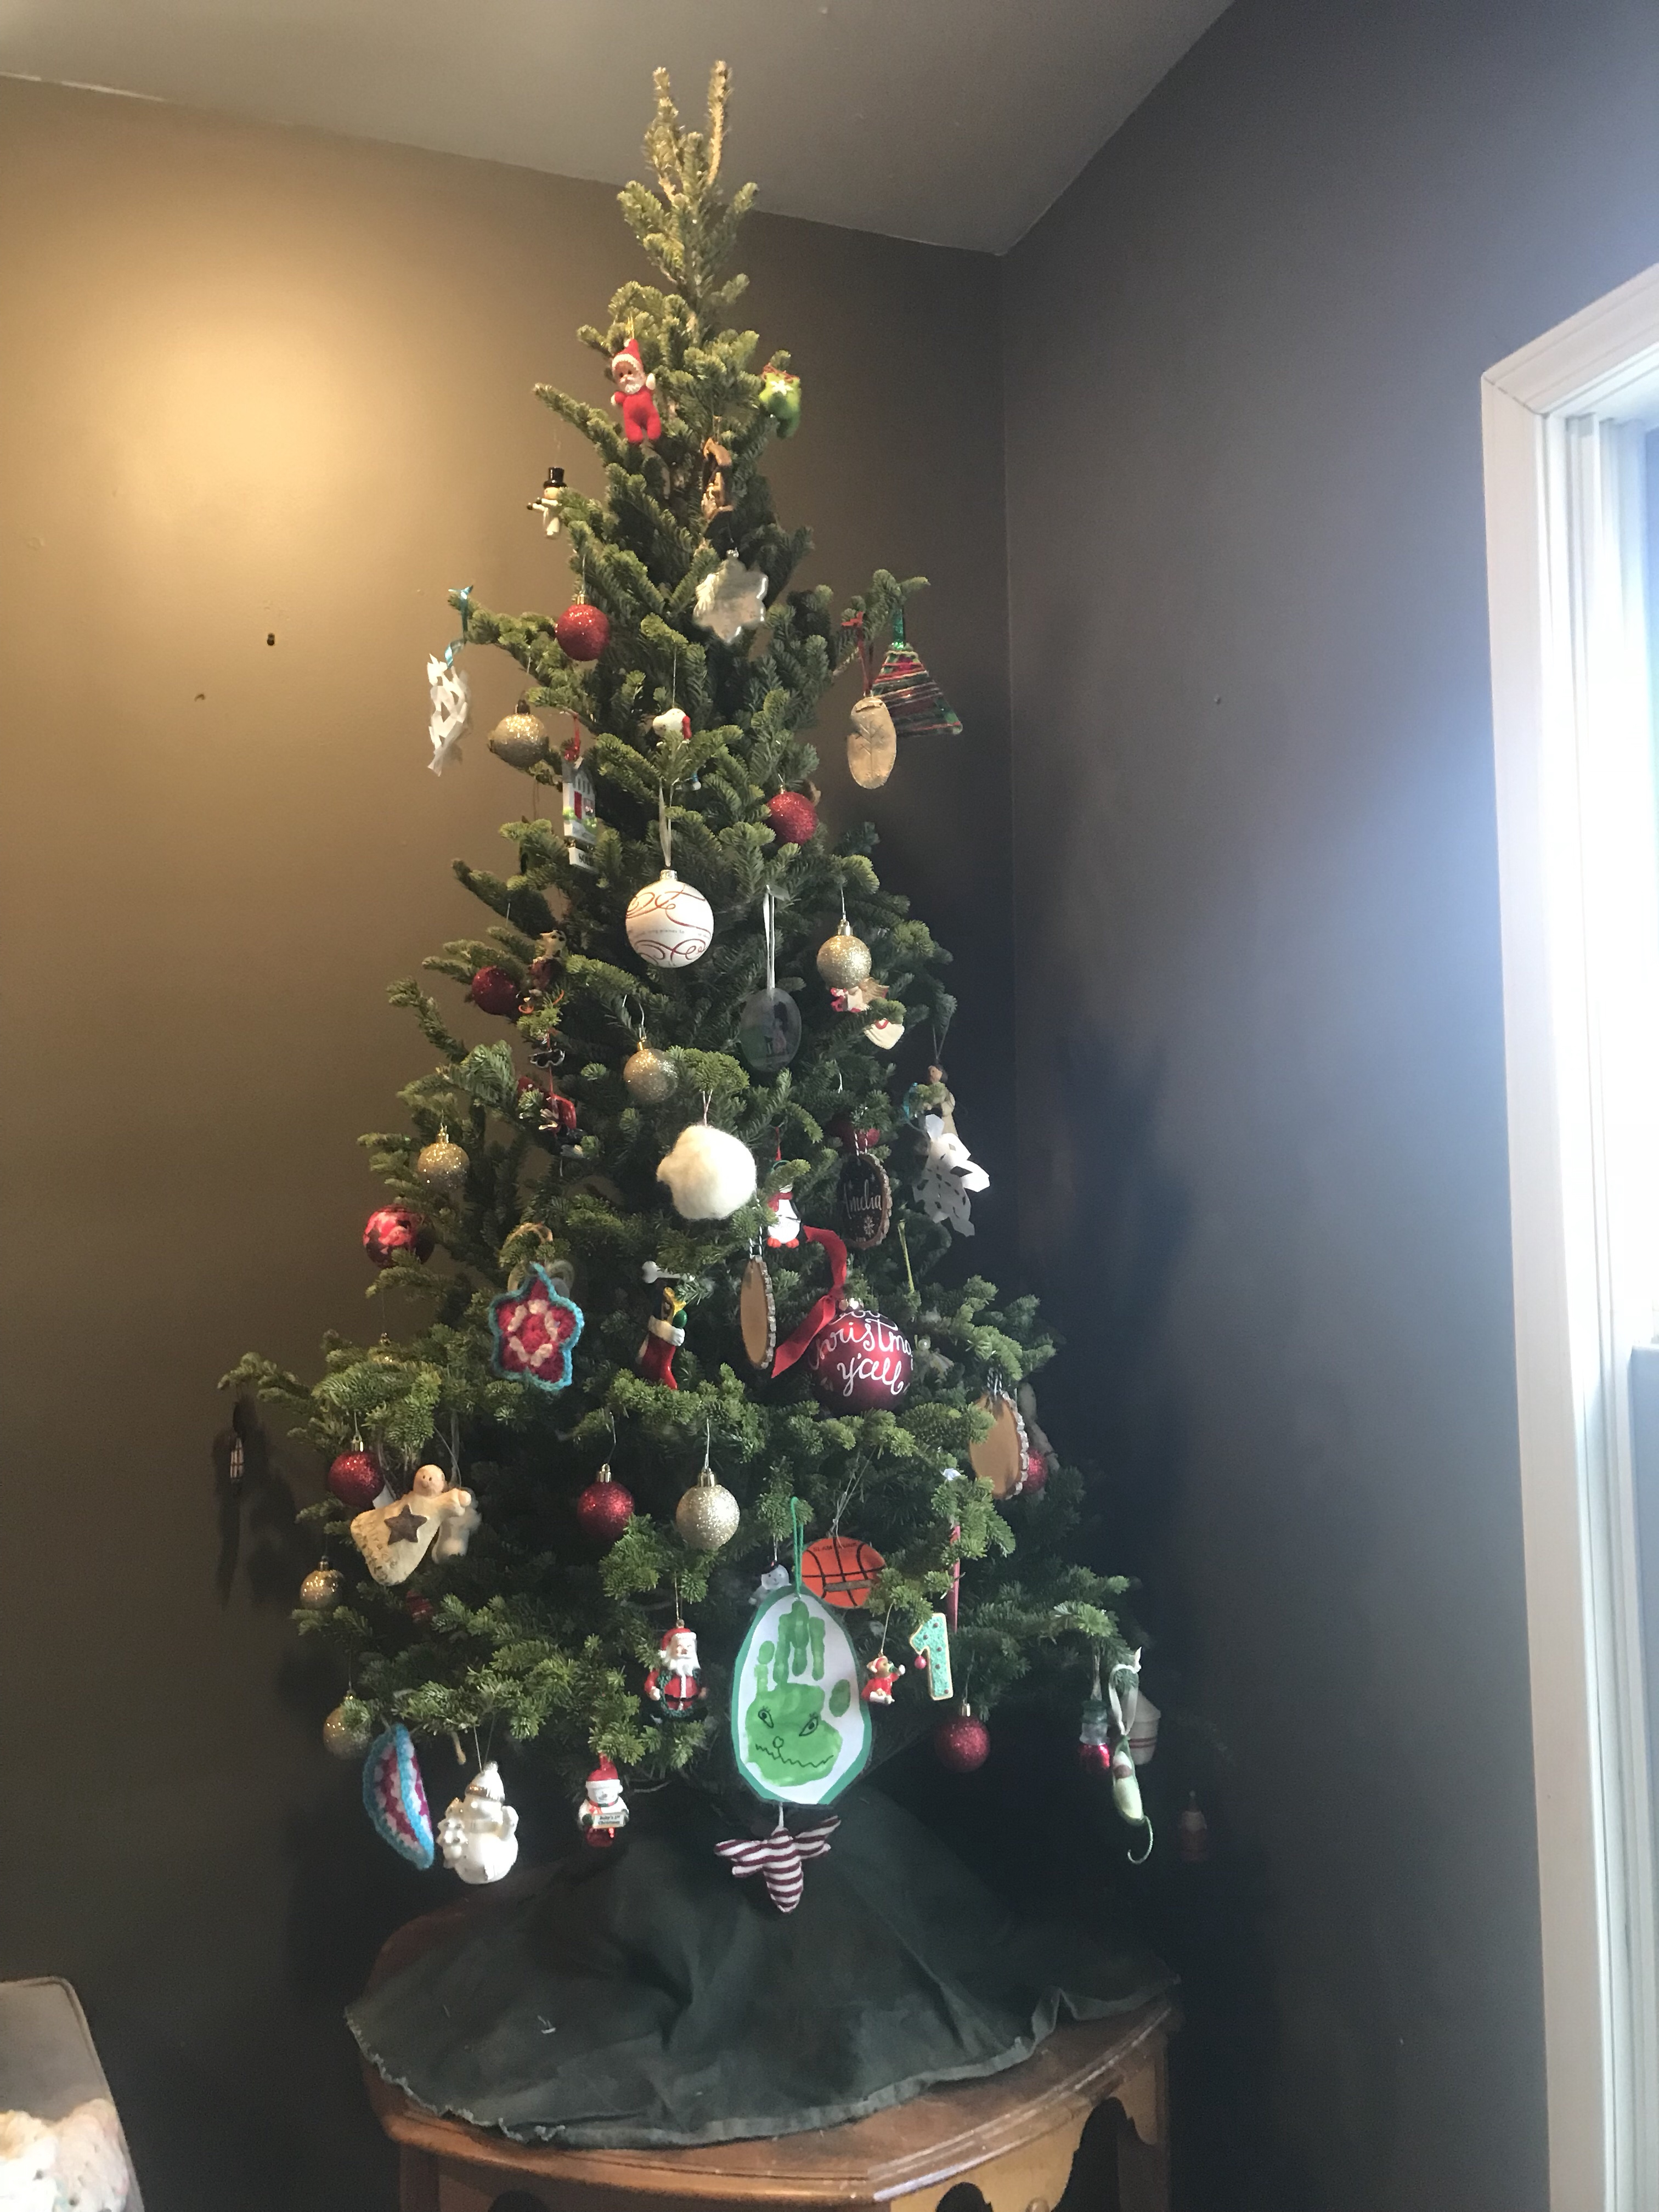 img_0427jpgw3024h4032 - Menards Christmas Trees